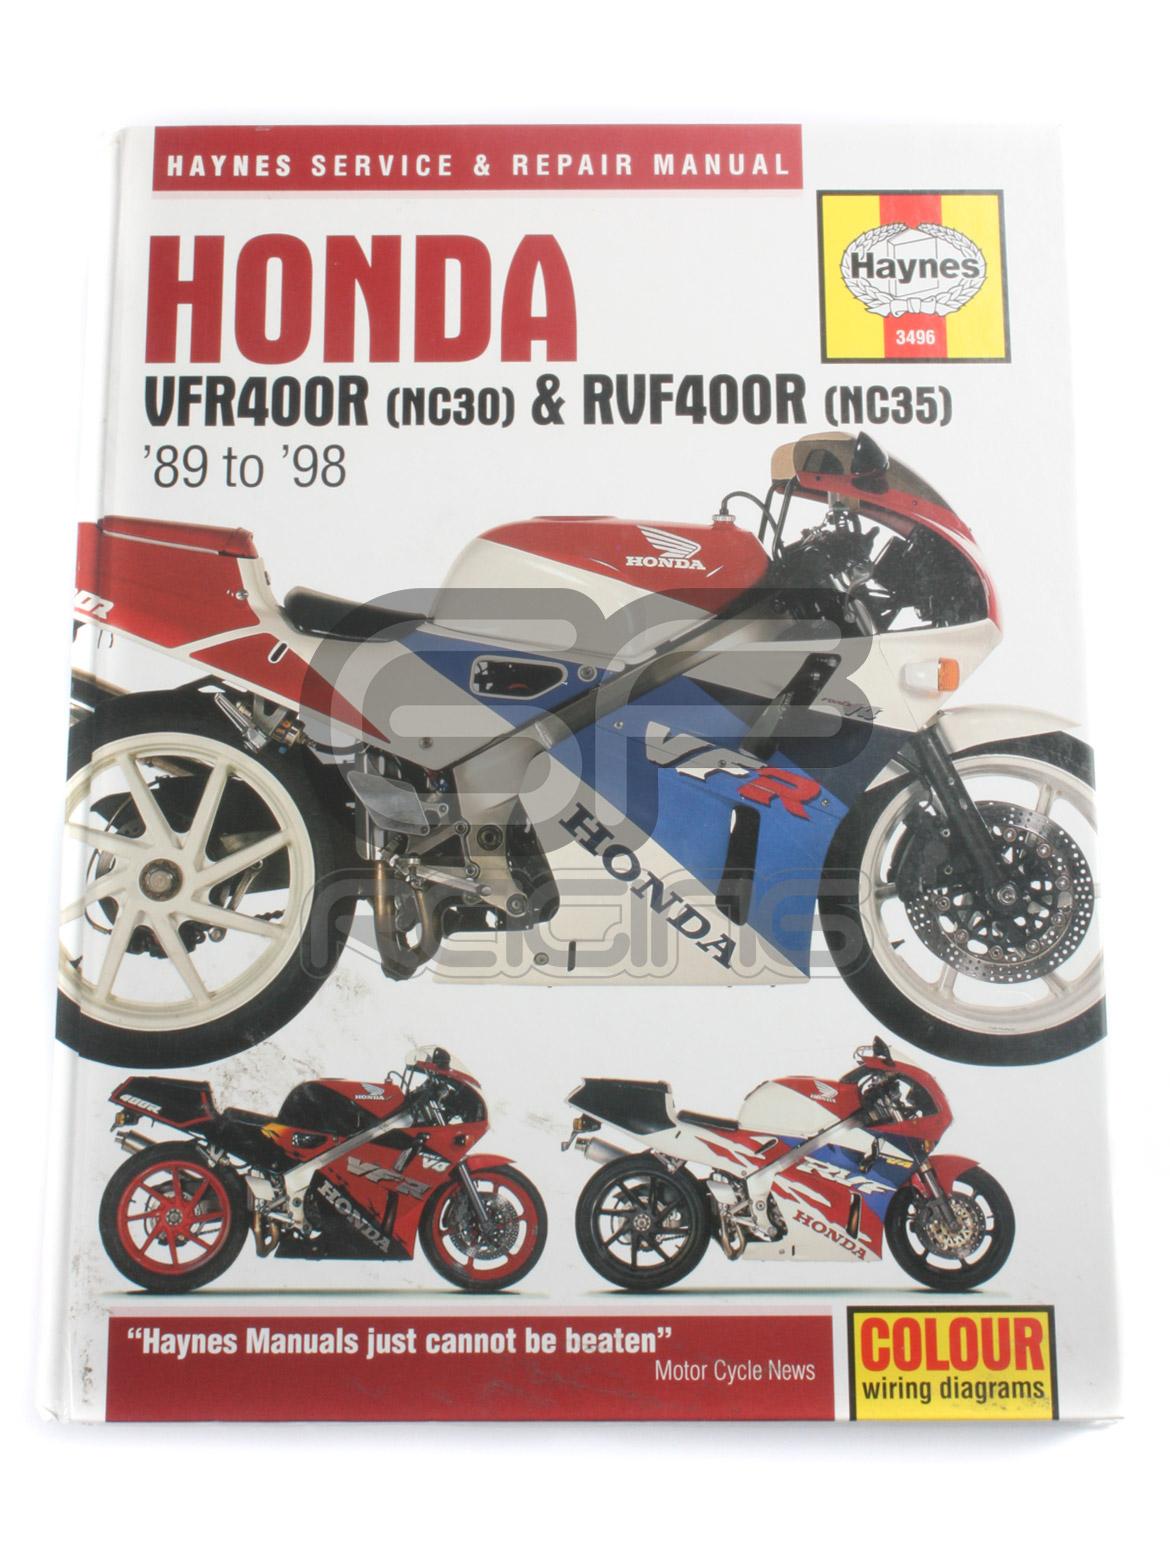 VFR400 RVF400 NC30 NC35 Haynes Workshop Manual